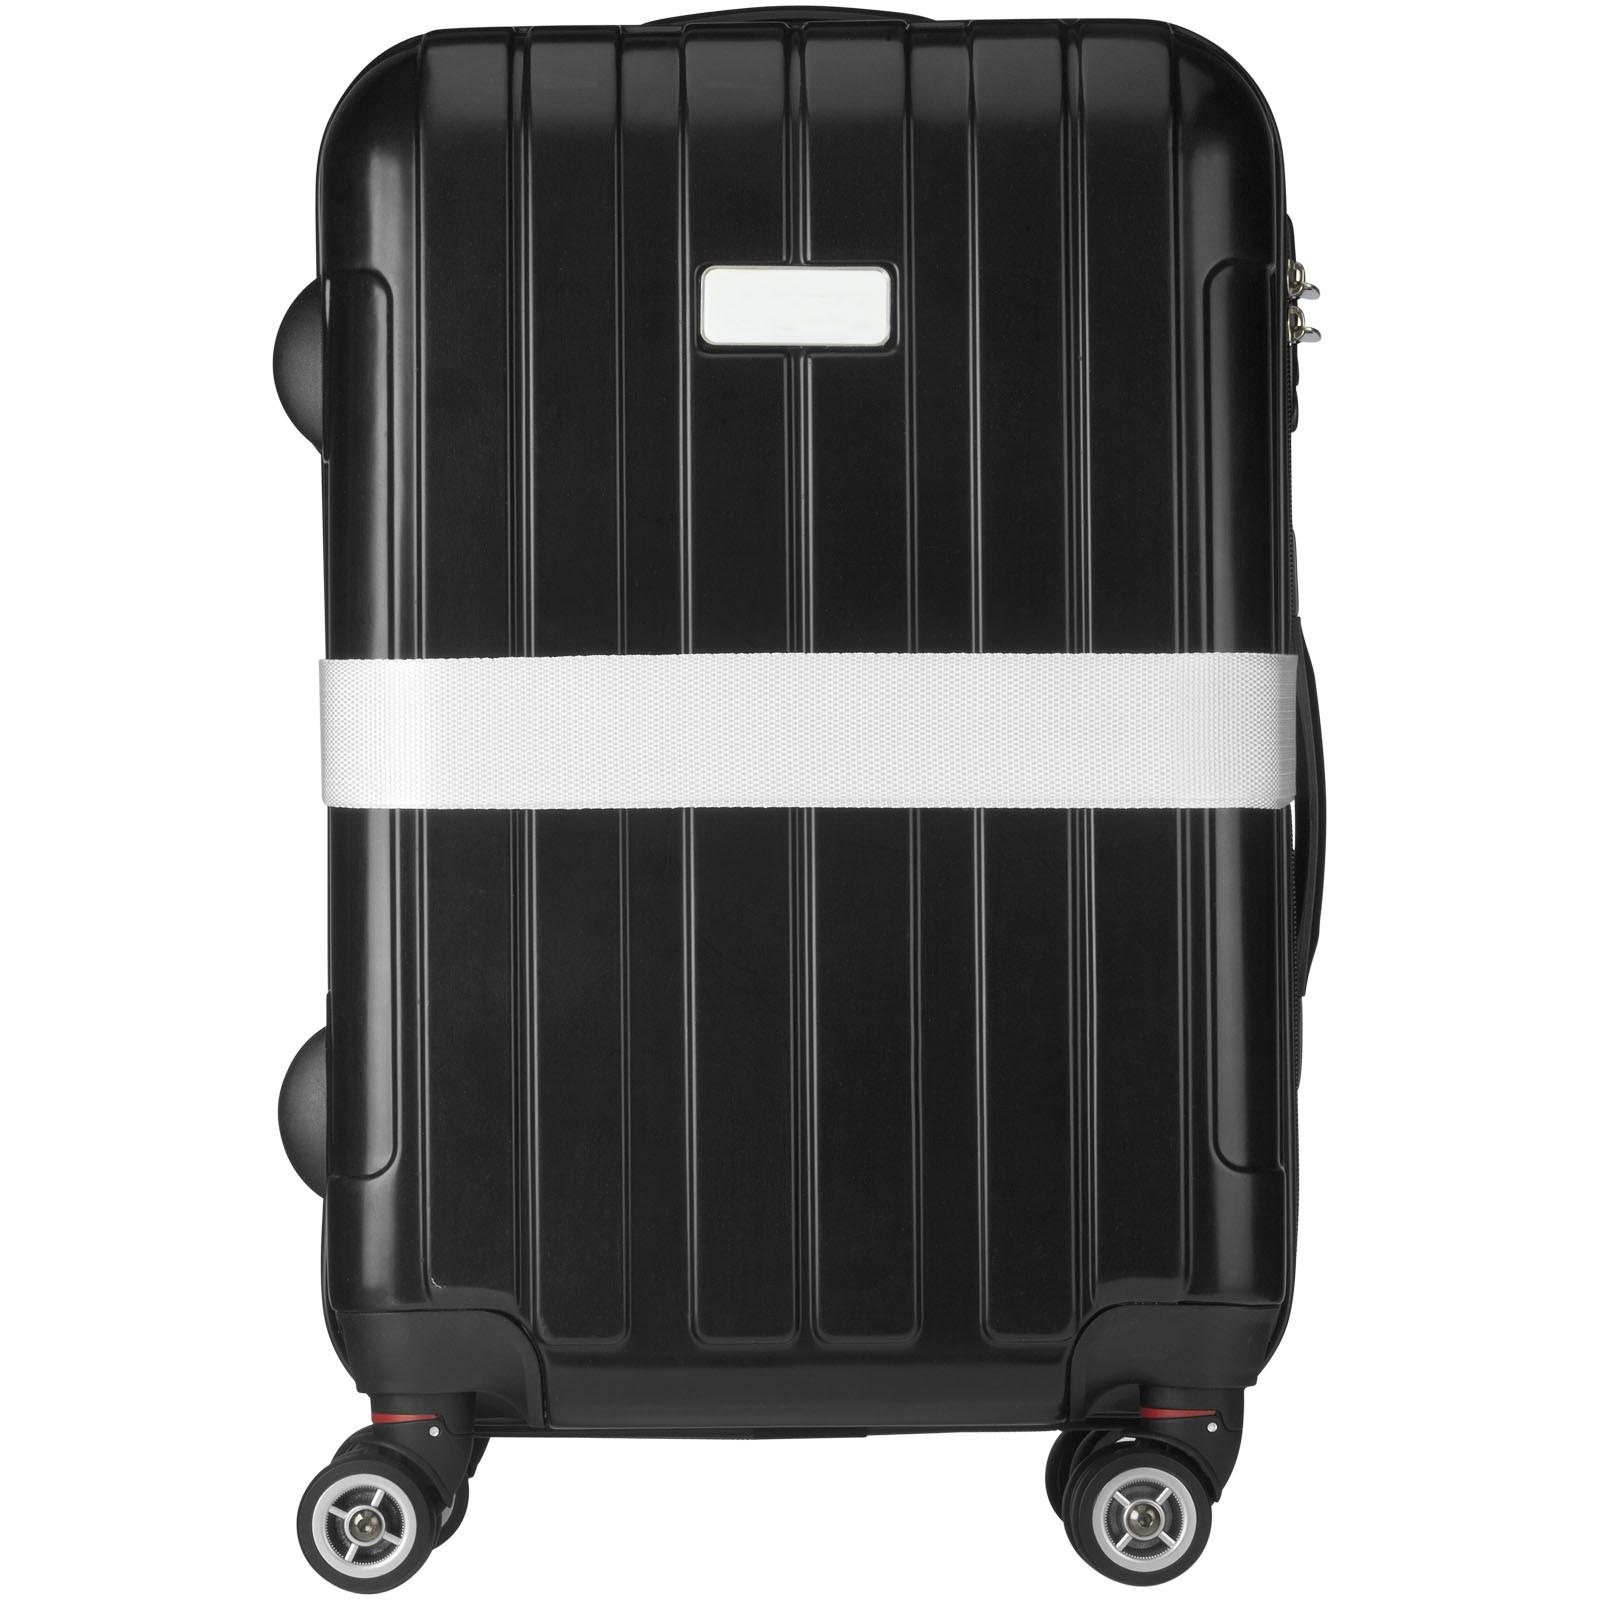 Saul suitcase strap - White